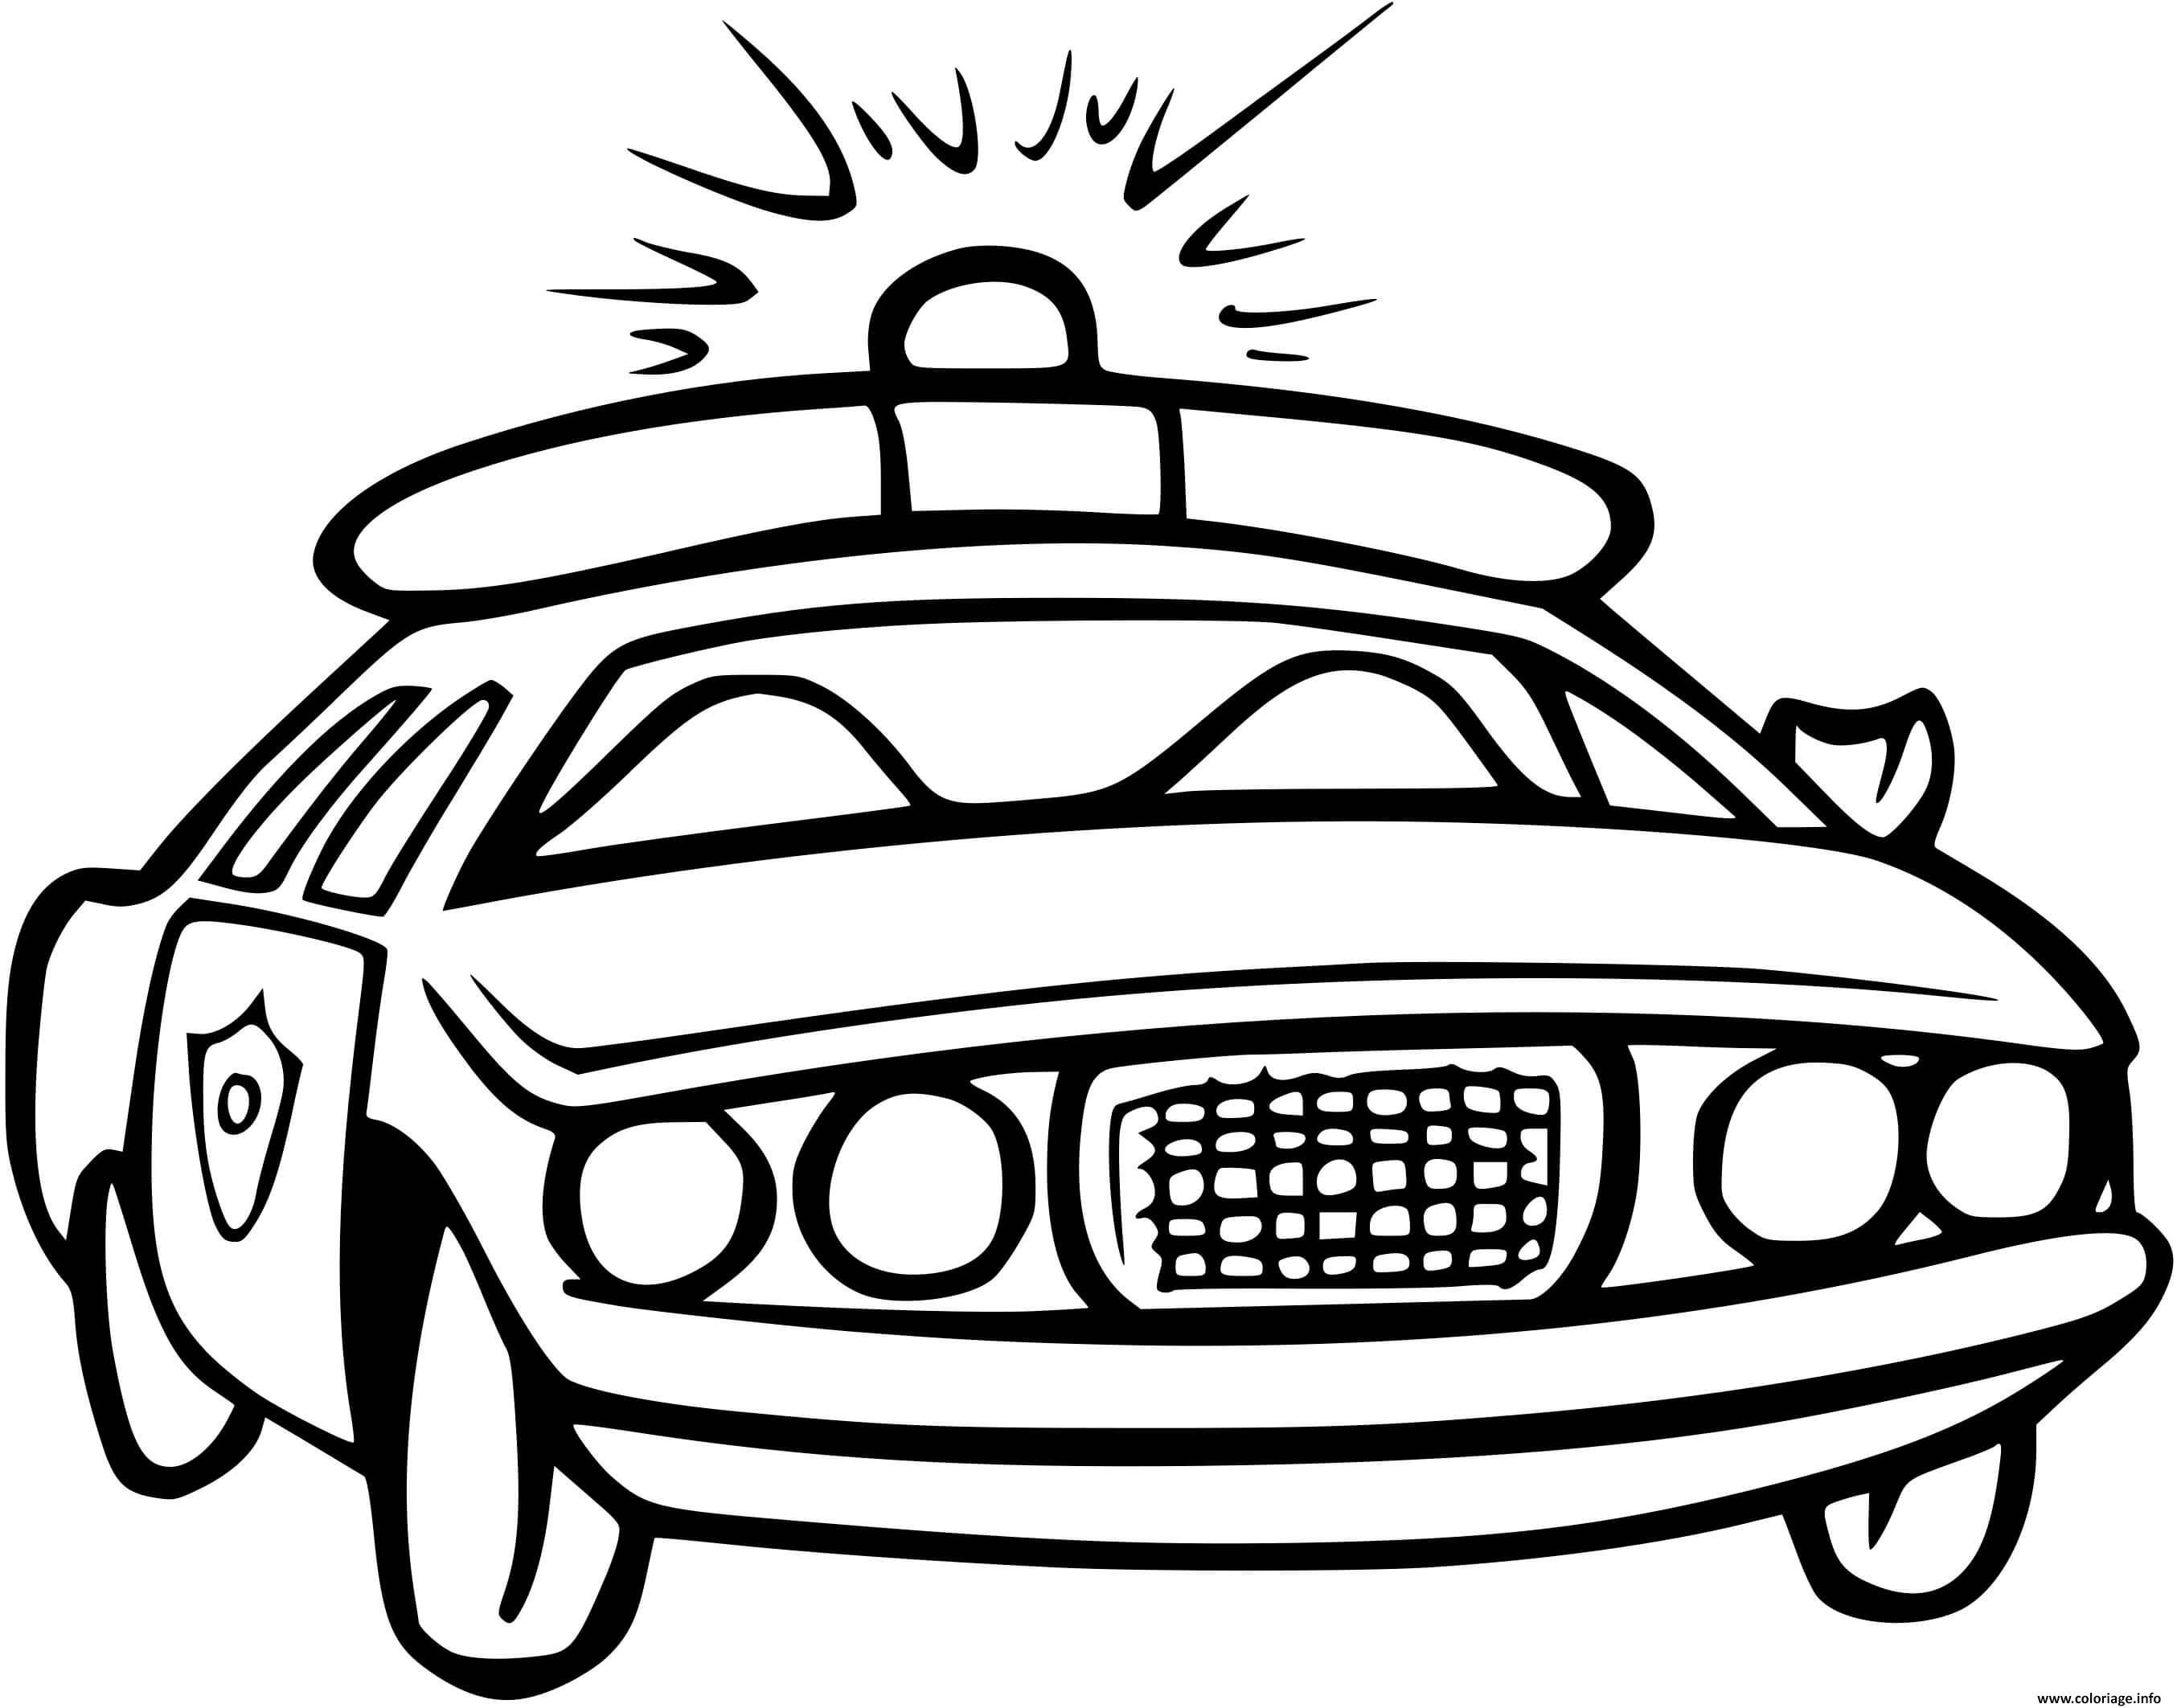 Coloriage Vehicule De Police Canadienne Dessin Voiture De ...